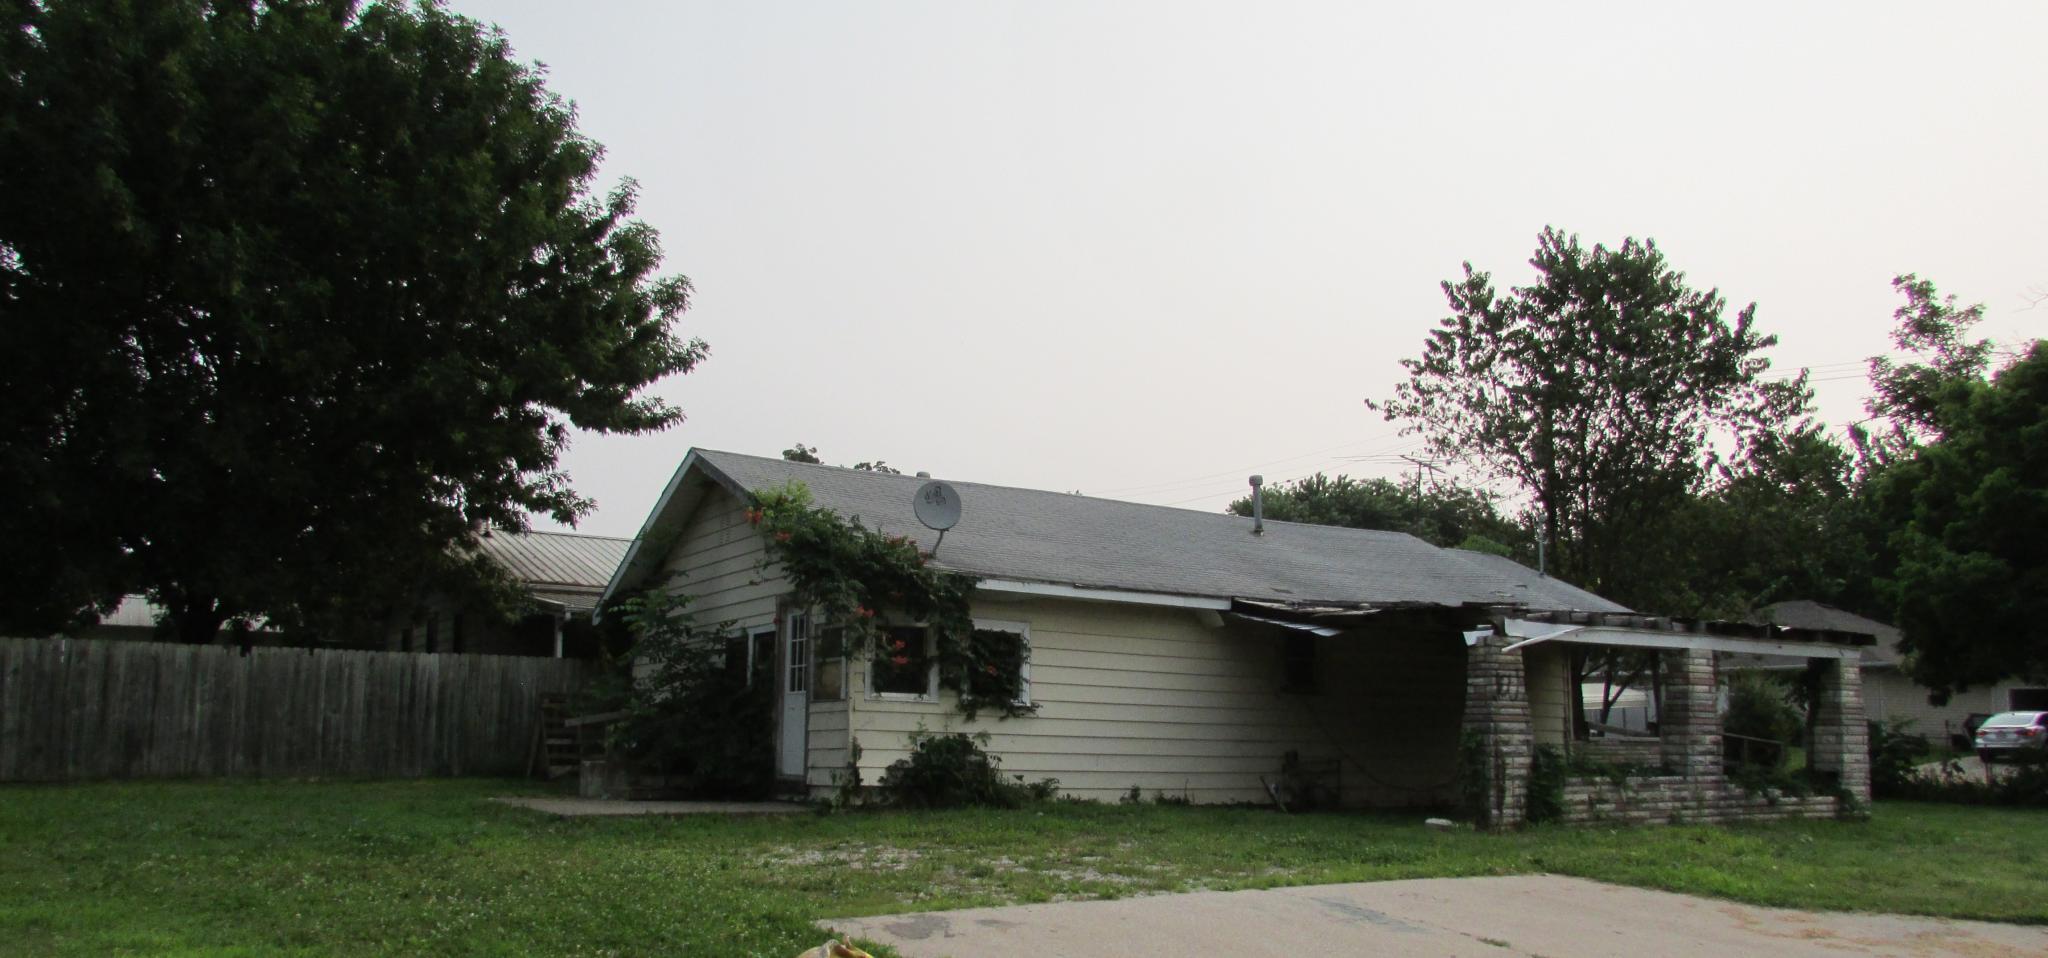 1401 N Ethyl Ave image #4